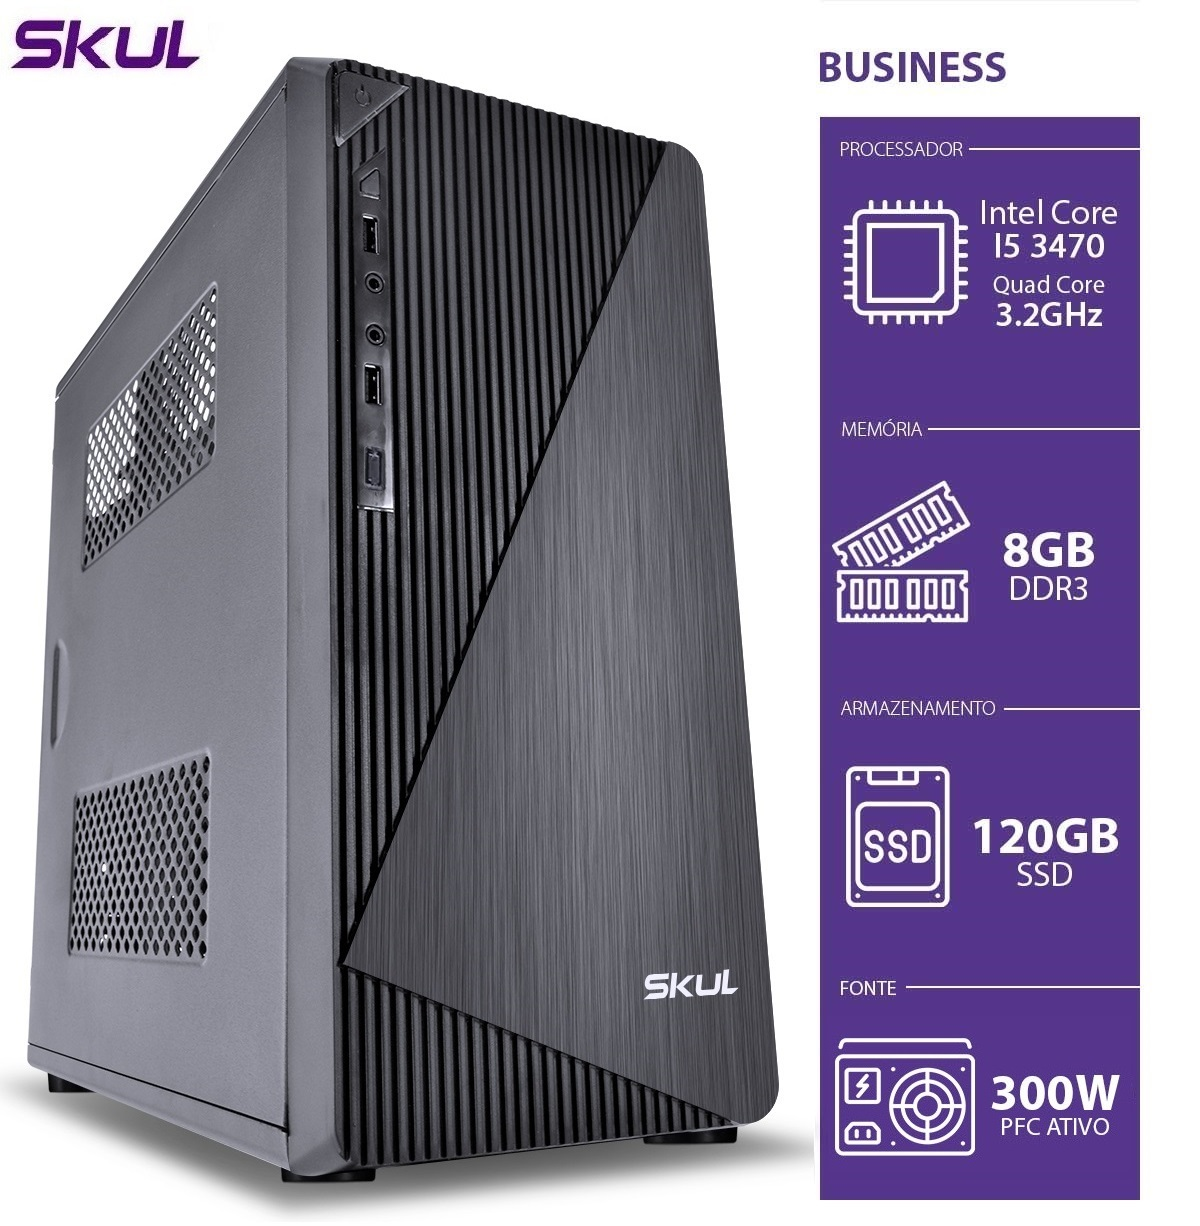 COMPUTADOR BUSINESS B500 - I5 3470 3.2GHZ 3ªGER MEM 8GB DDR3 SSD 120GB HDMI/VGA FONTE 300W  - Audio Video & cia